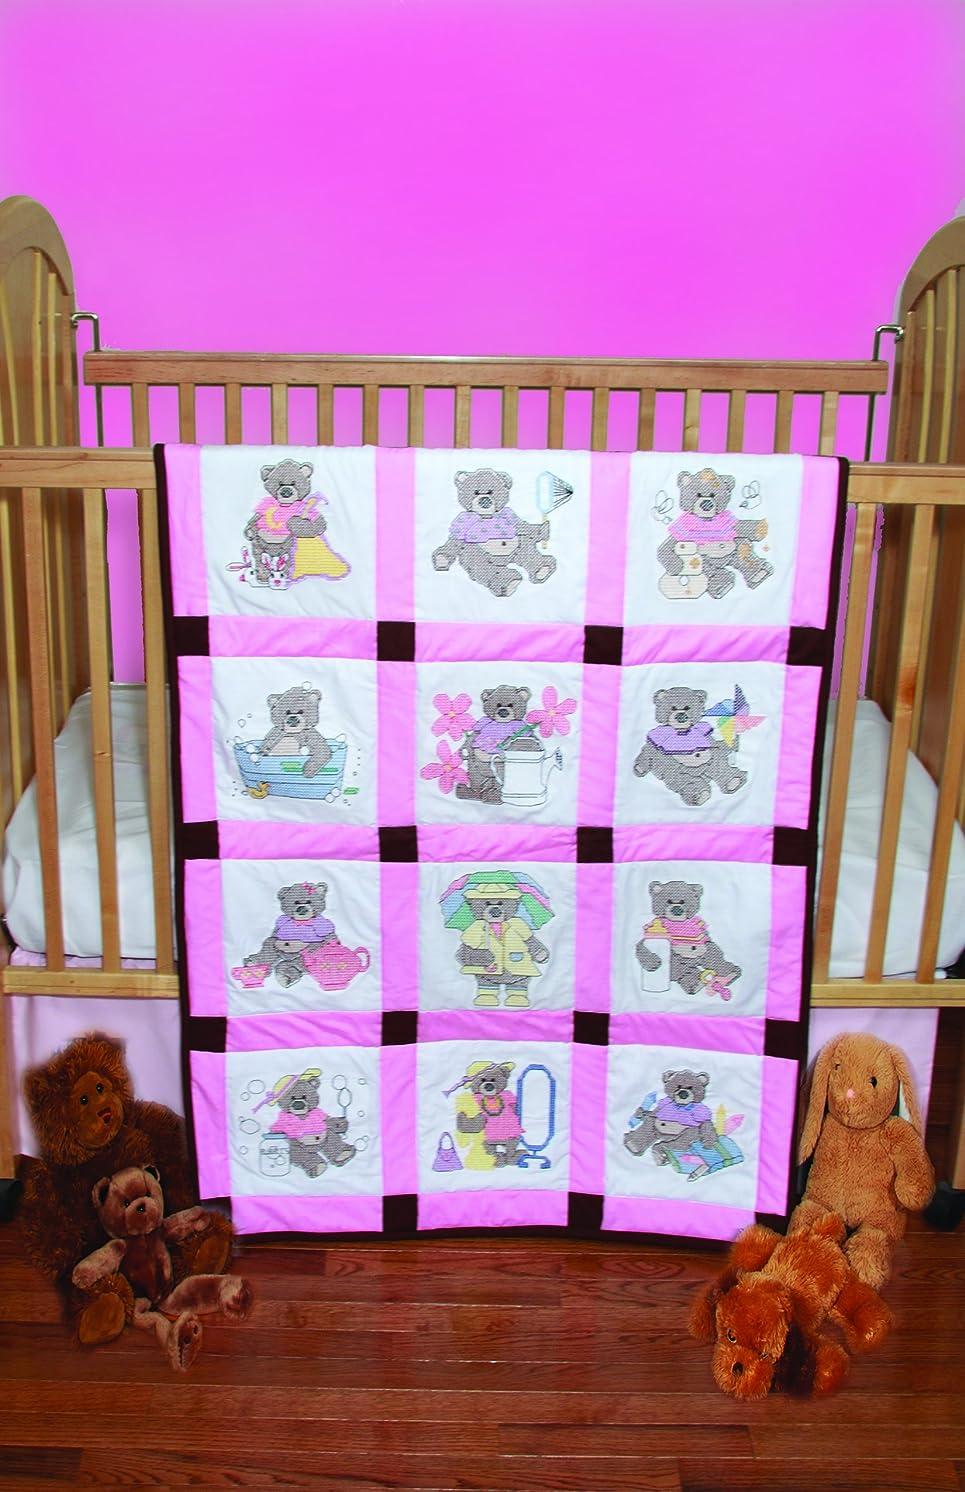 Fairway 92320 Baby Quilt Block, Cross Stitch Girl Bear Design, Twelve Blocks, White